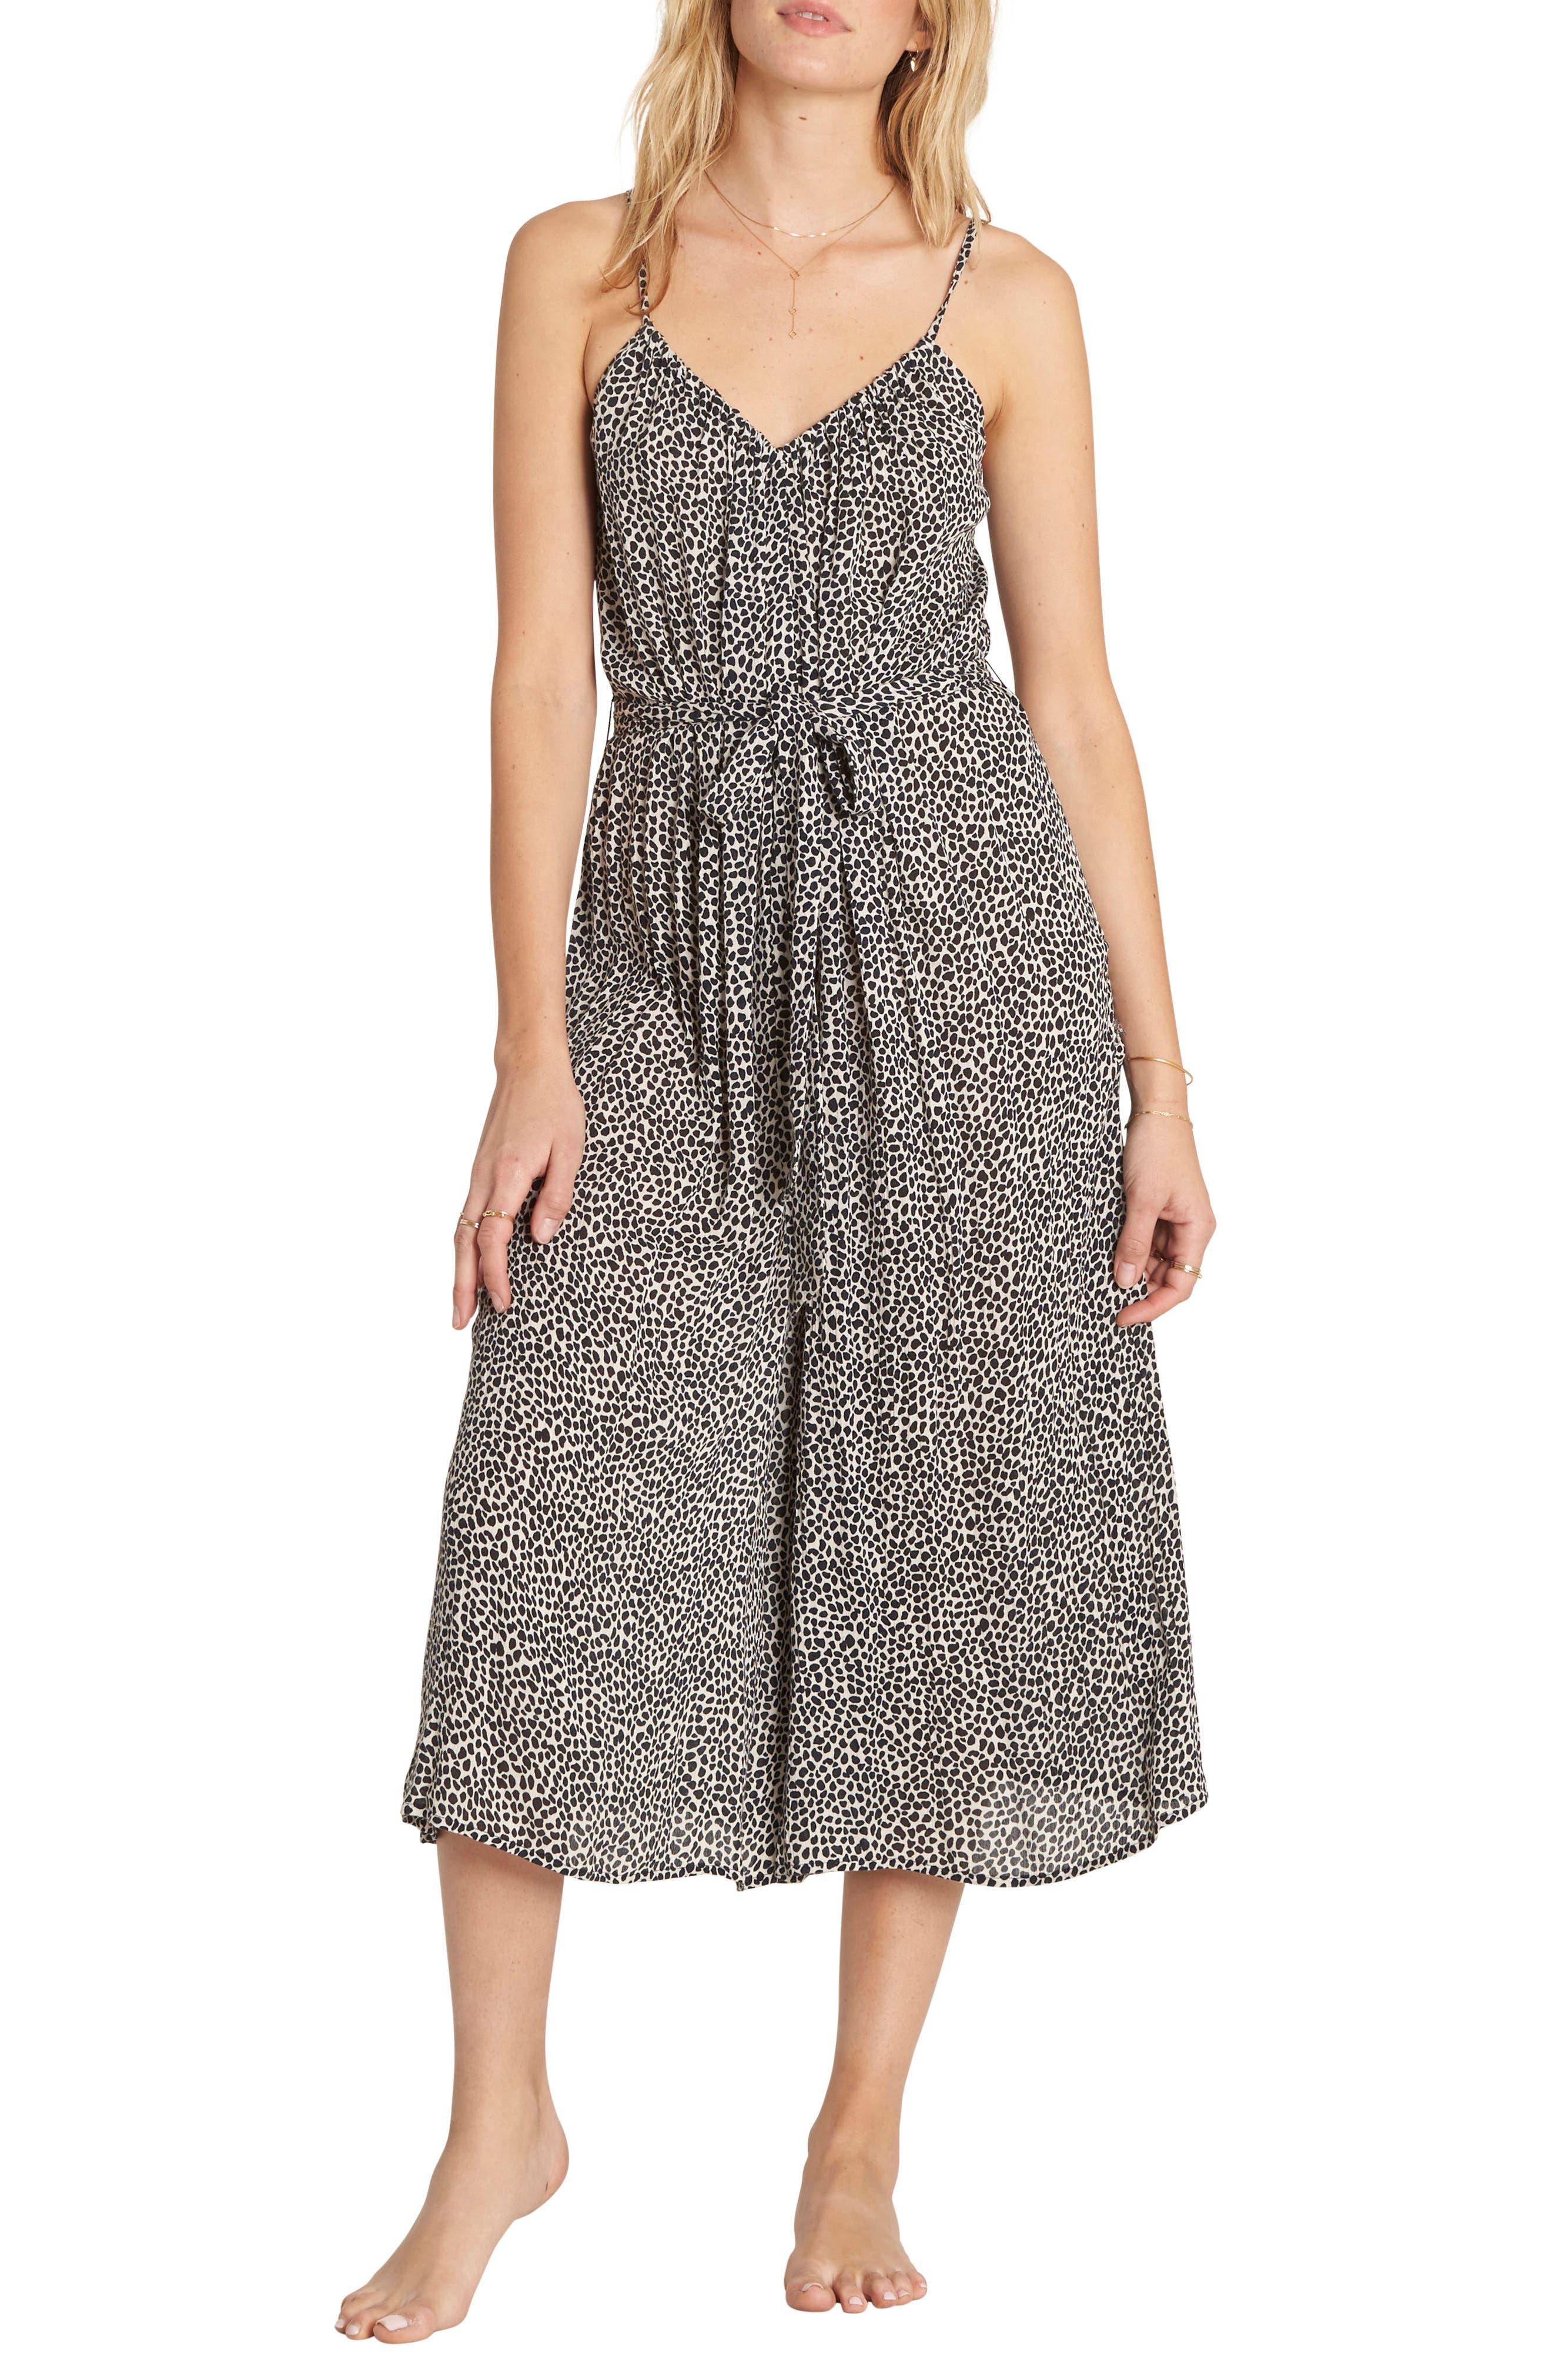 Wild Hearts Tie Waist Midi Dress,                         Main,                         color, 900